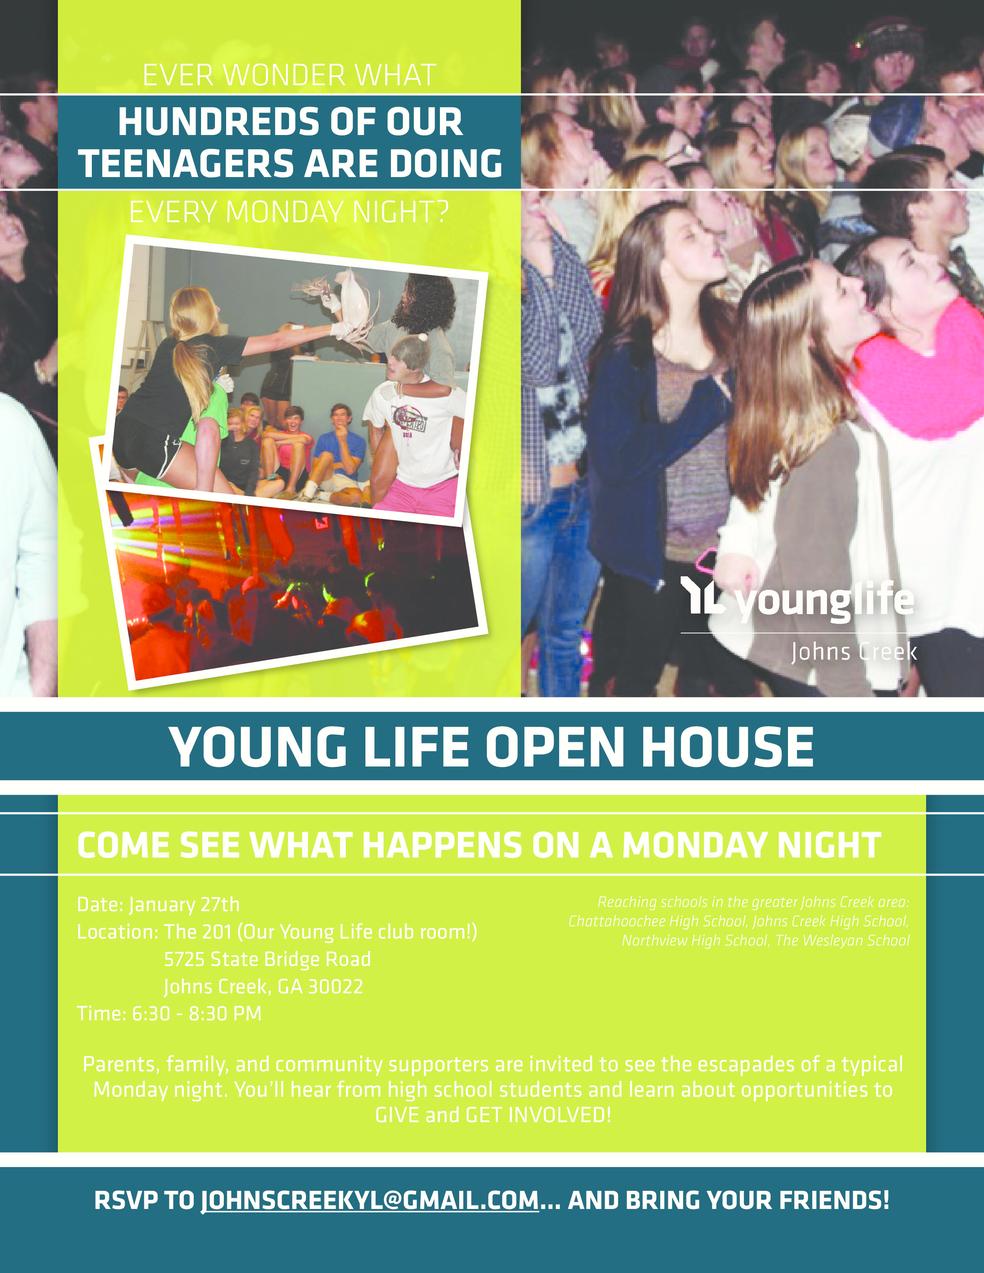 Young Life Open House | Johns Creek, GA Patch